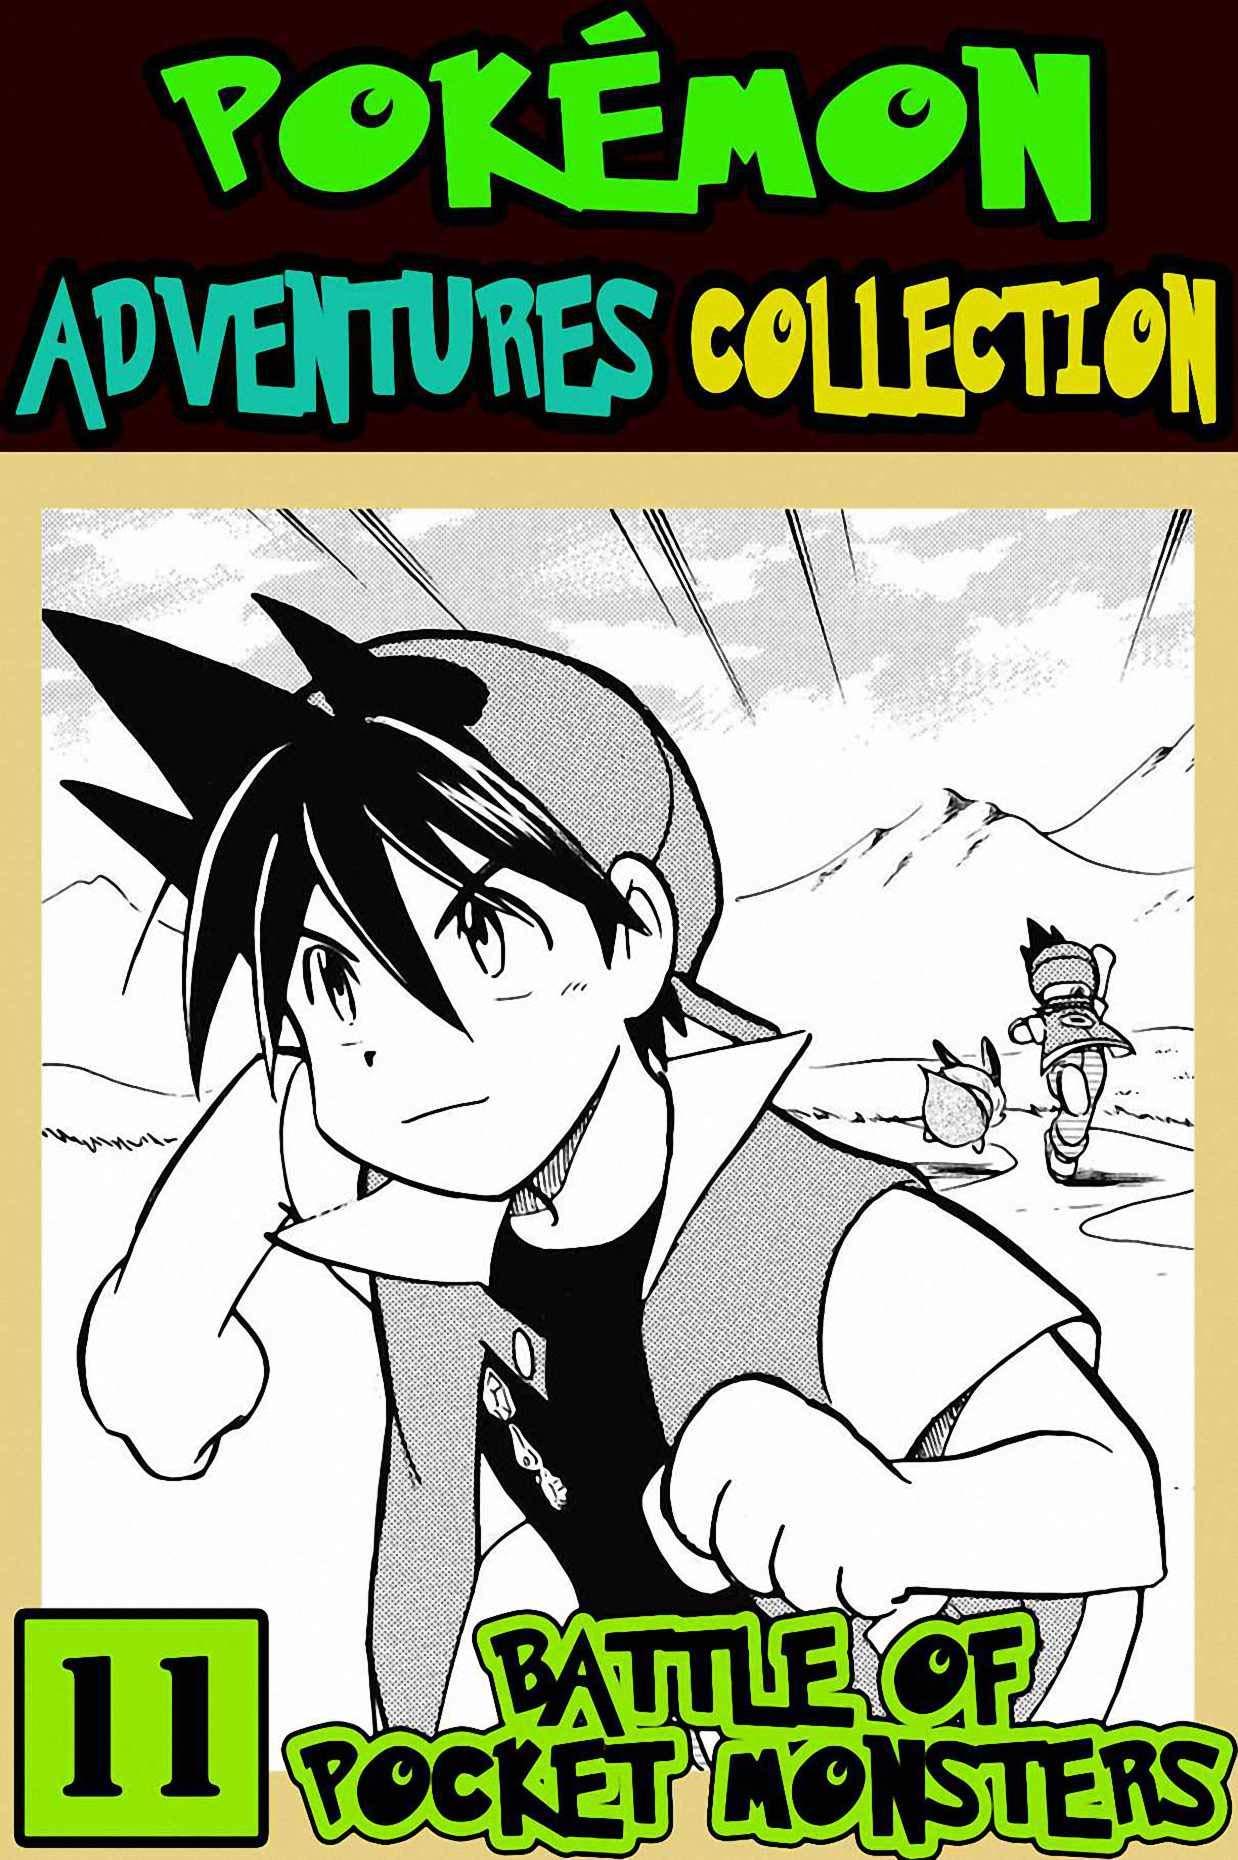 Battle Pocket: Collection 11 - Pokemon Manga Adventures Graphic Novel For Boys, Girls, Kids